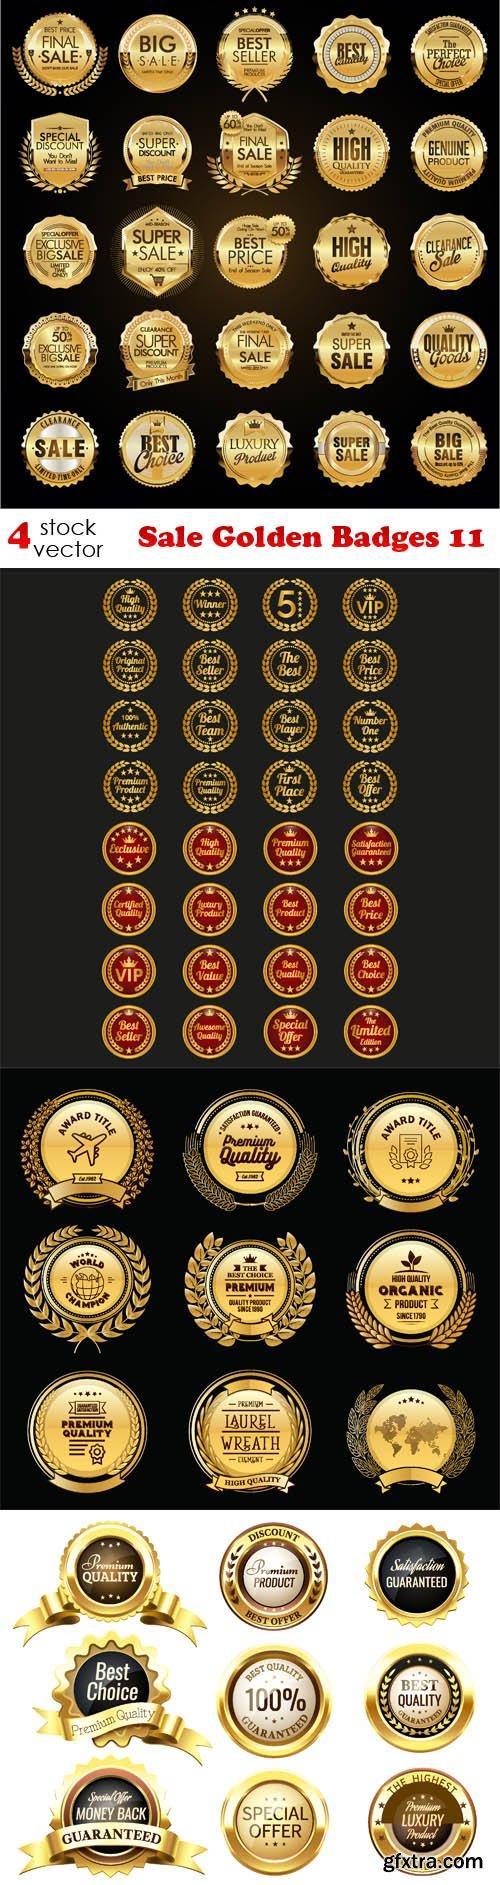 Vectors - Sale Golden Badges 11